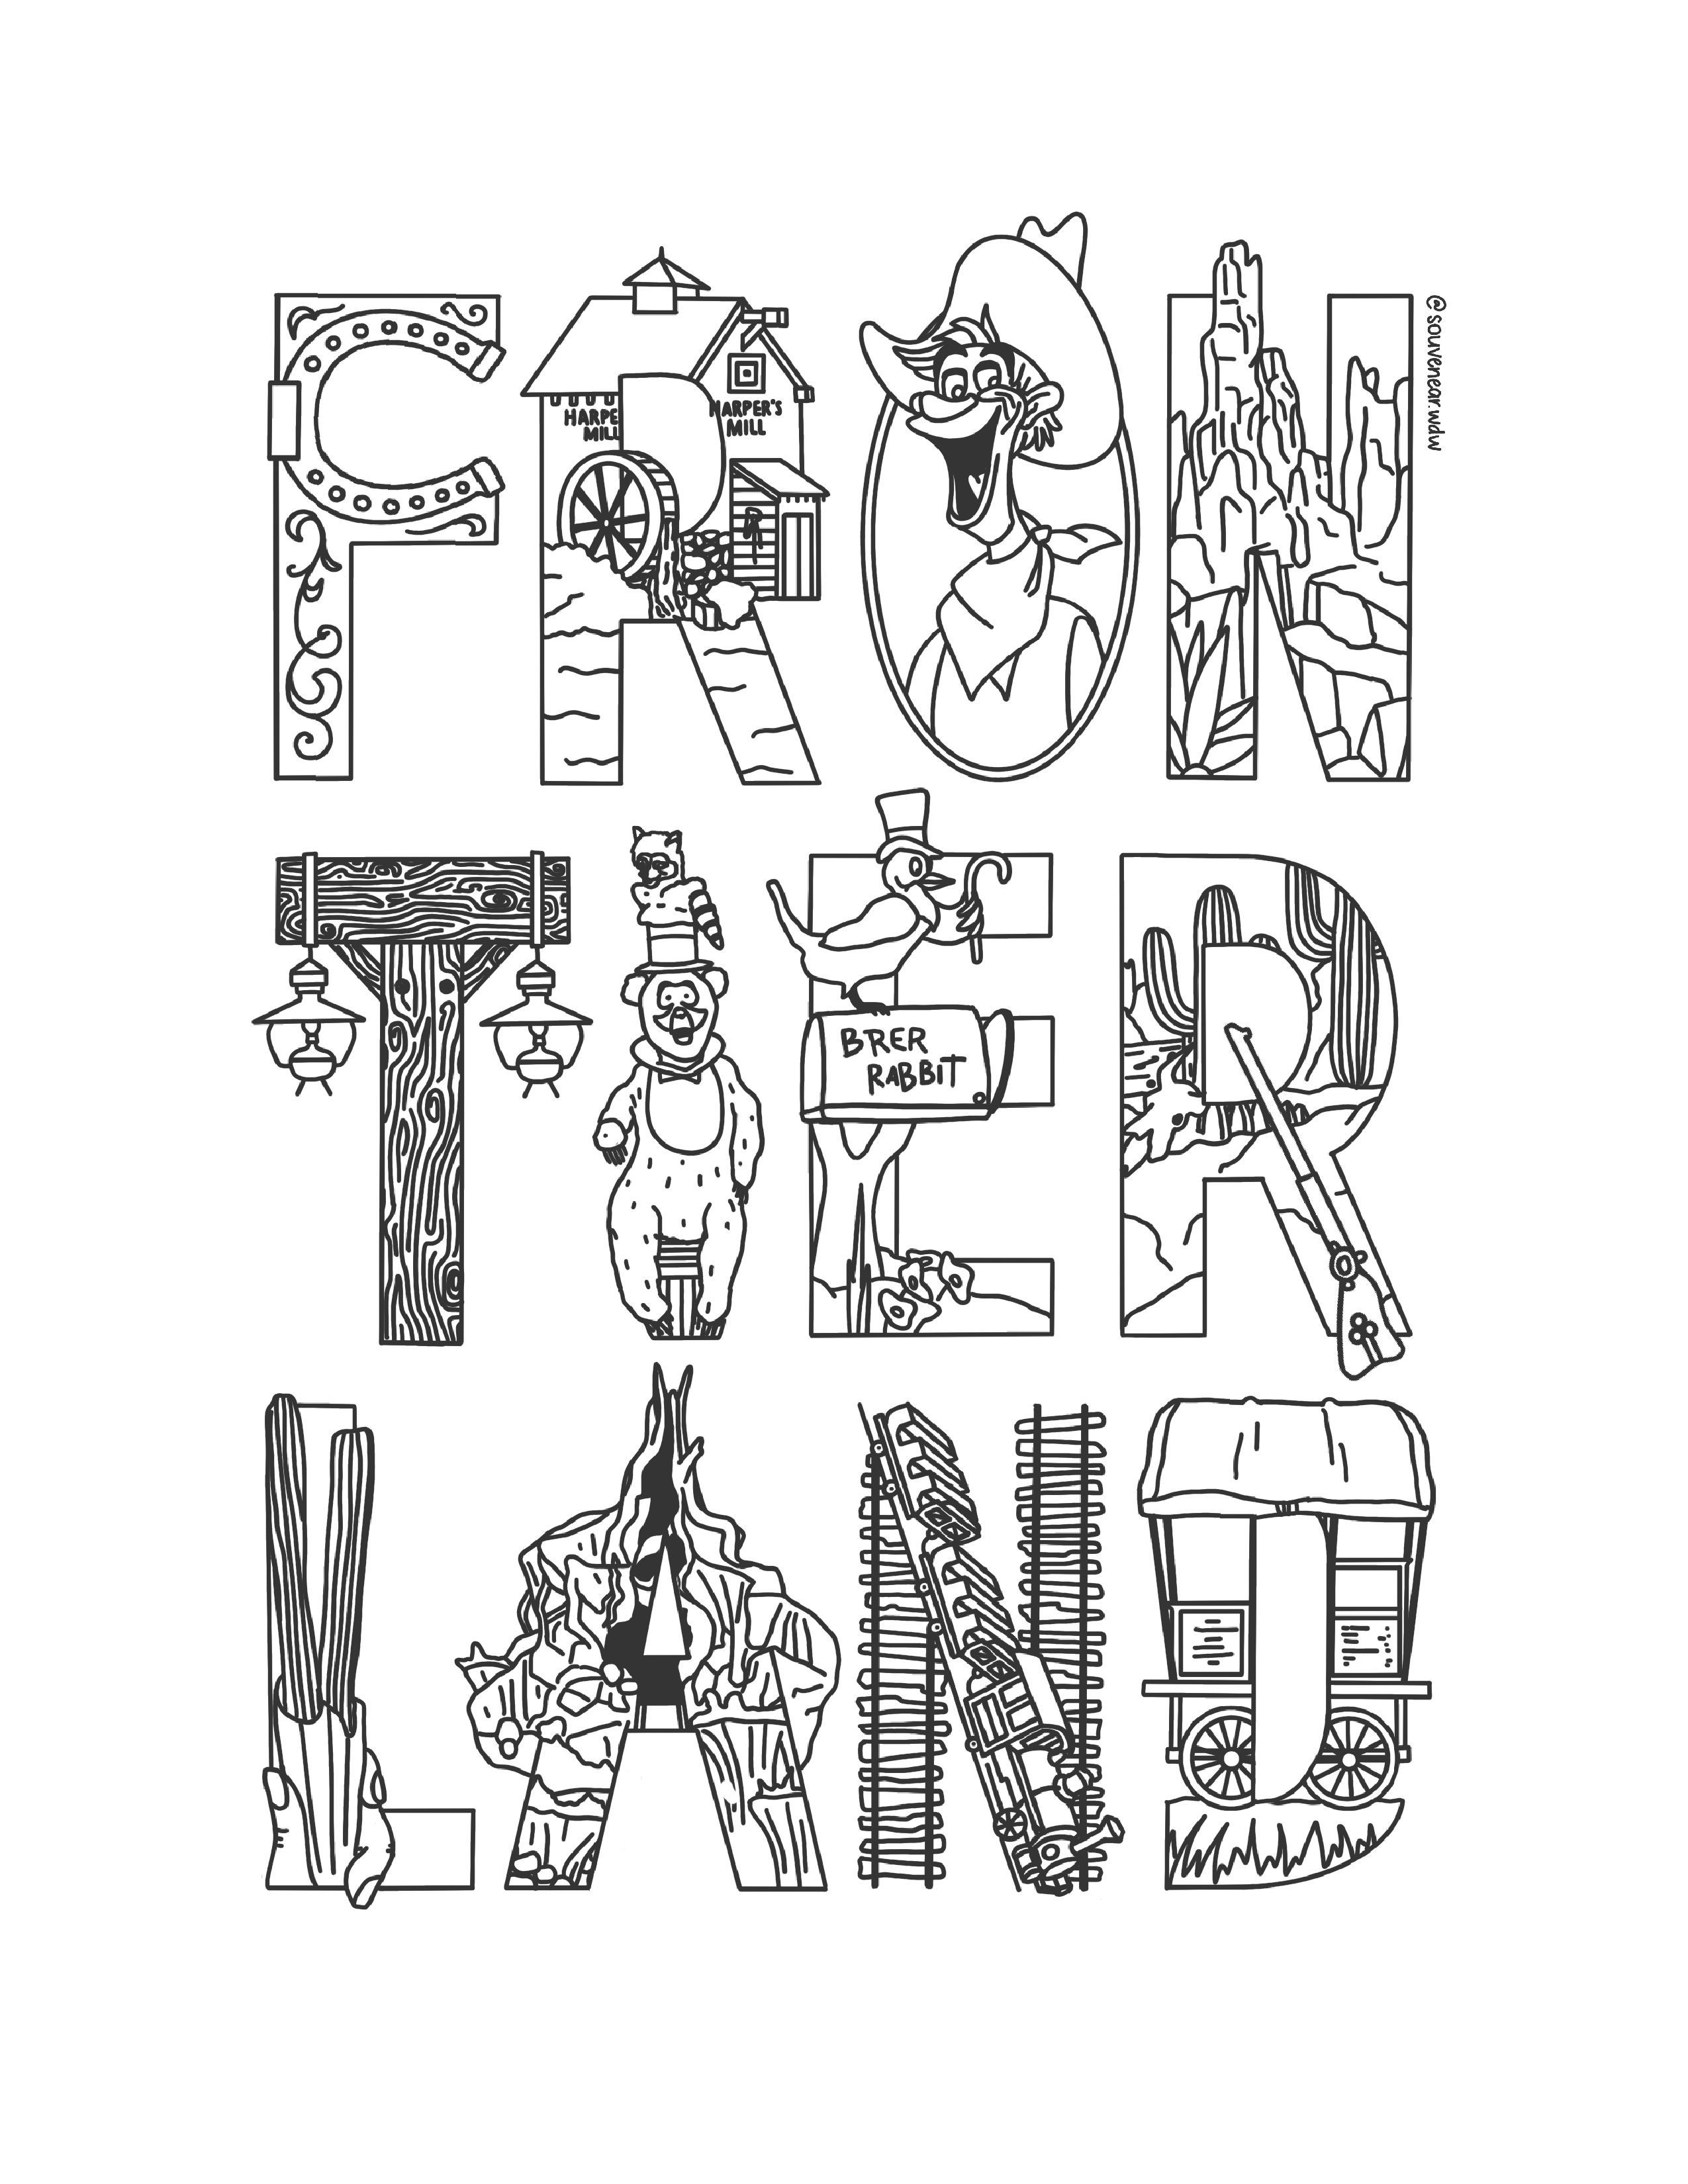 Frontierland Free Coloring Sheet Souvenear Free Printable Coloring Sheets Free Coloring Sheets Coloring Sheets